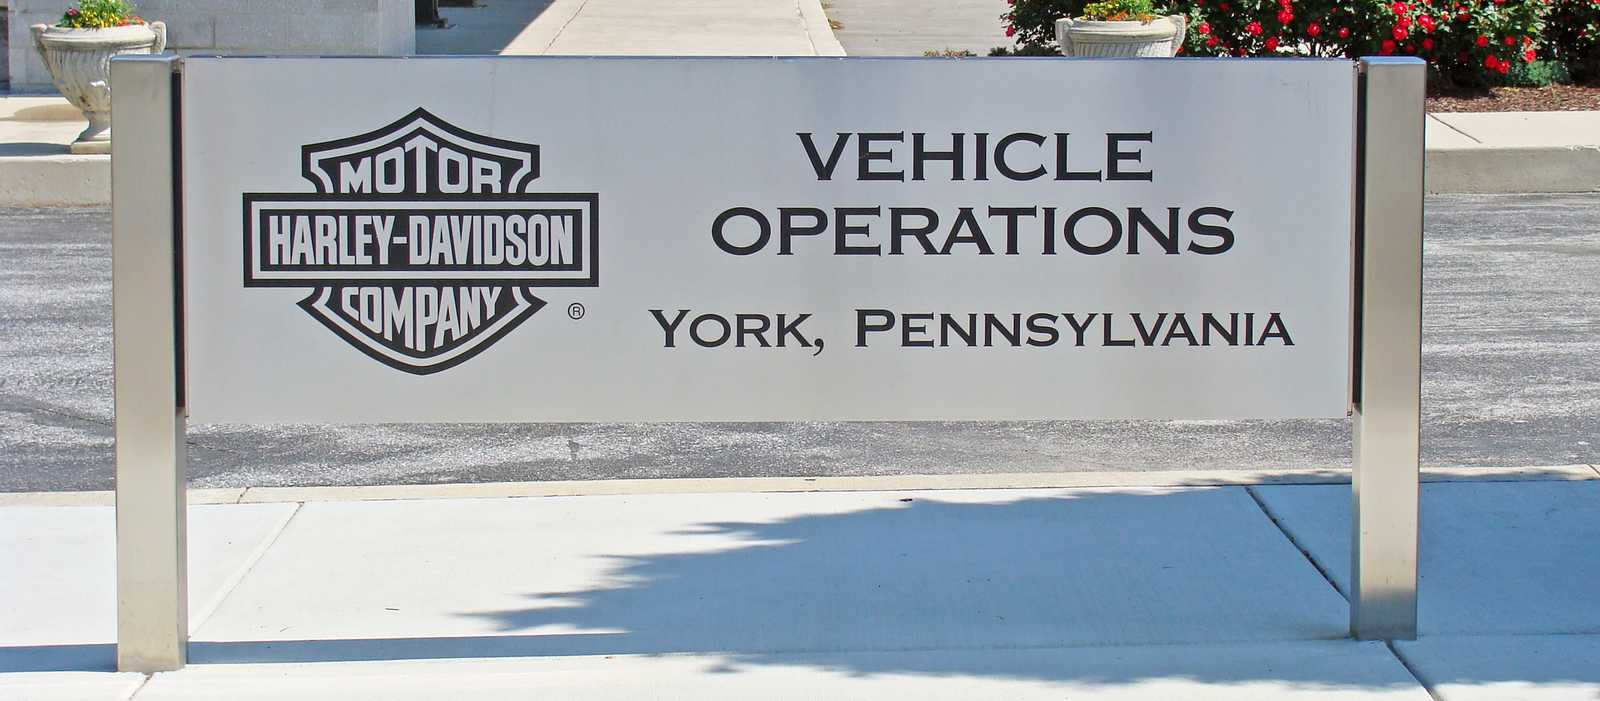 Harey Davidson Plant York, PA